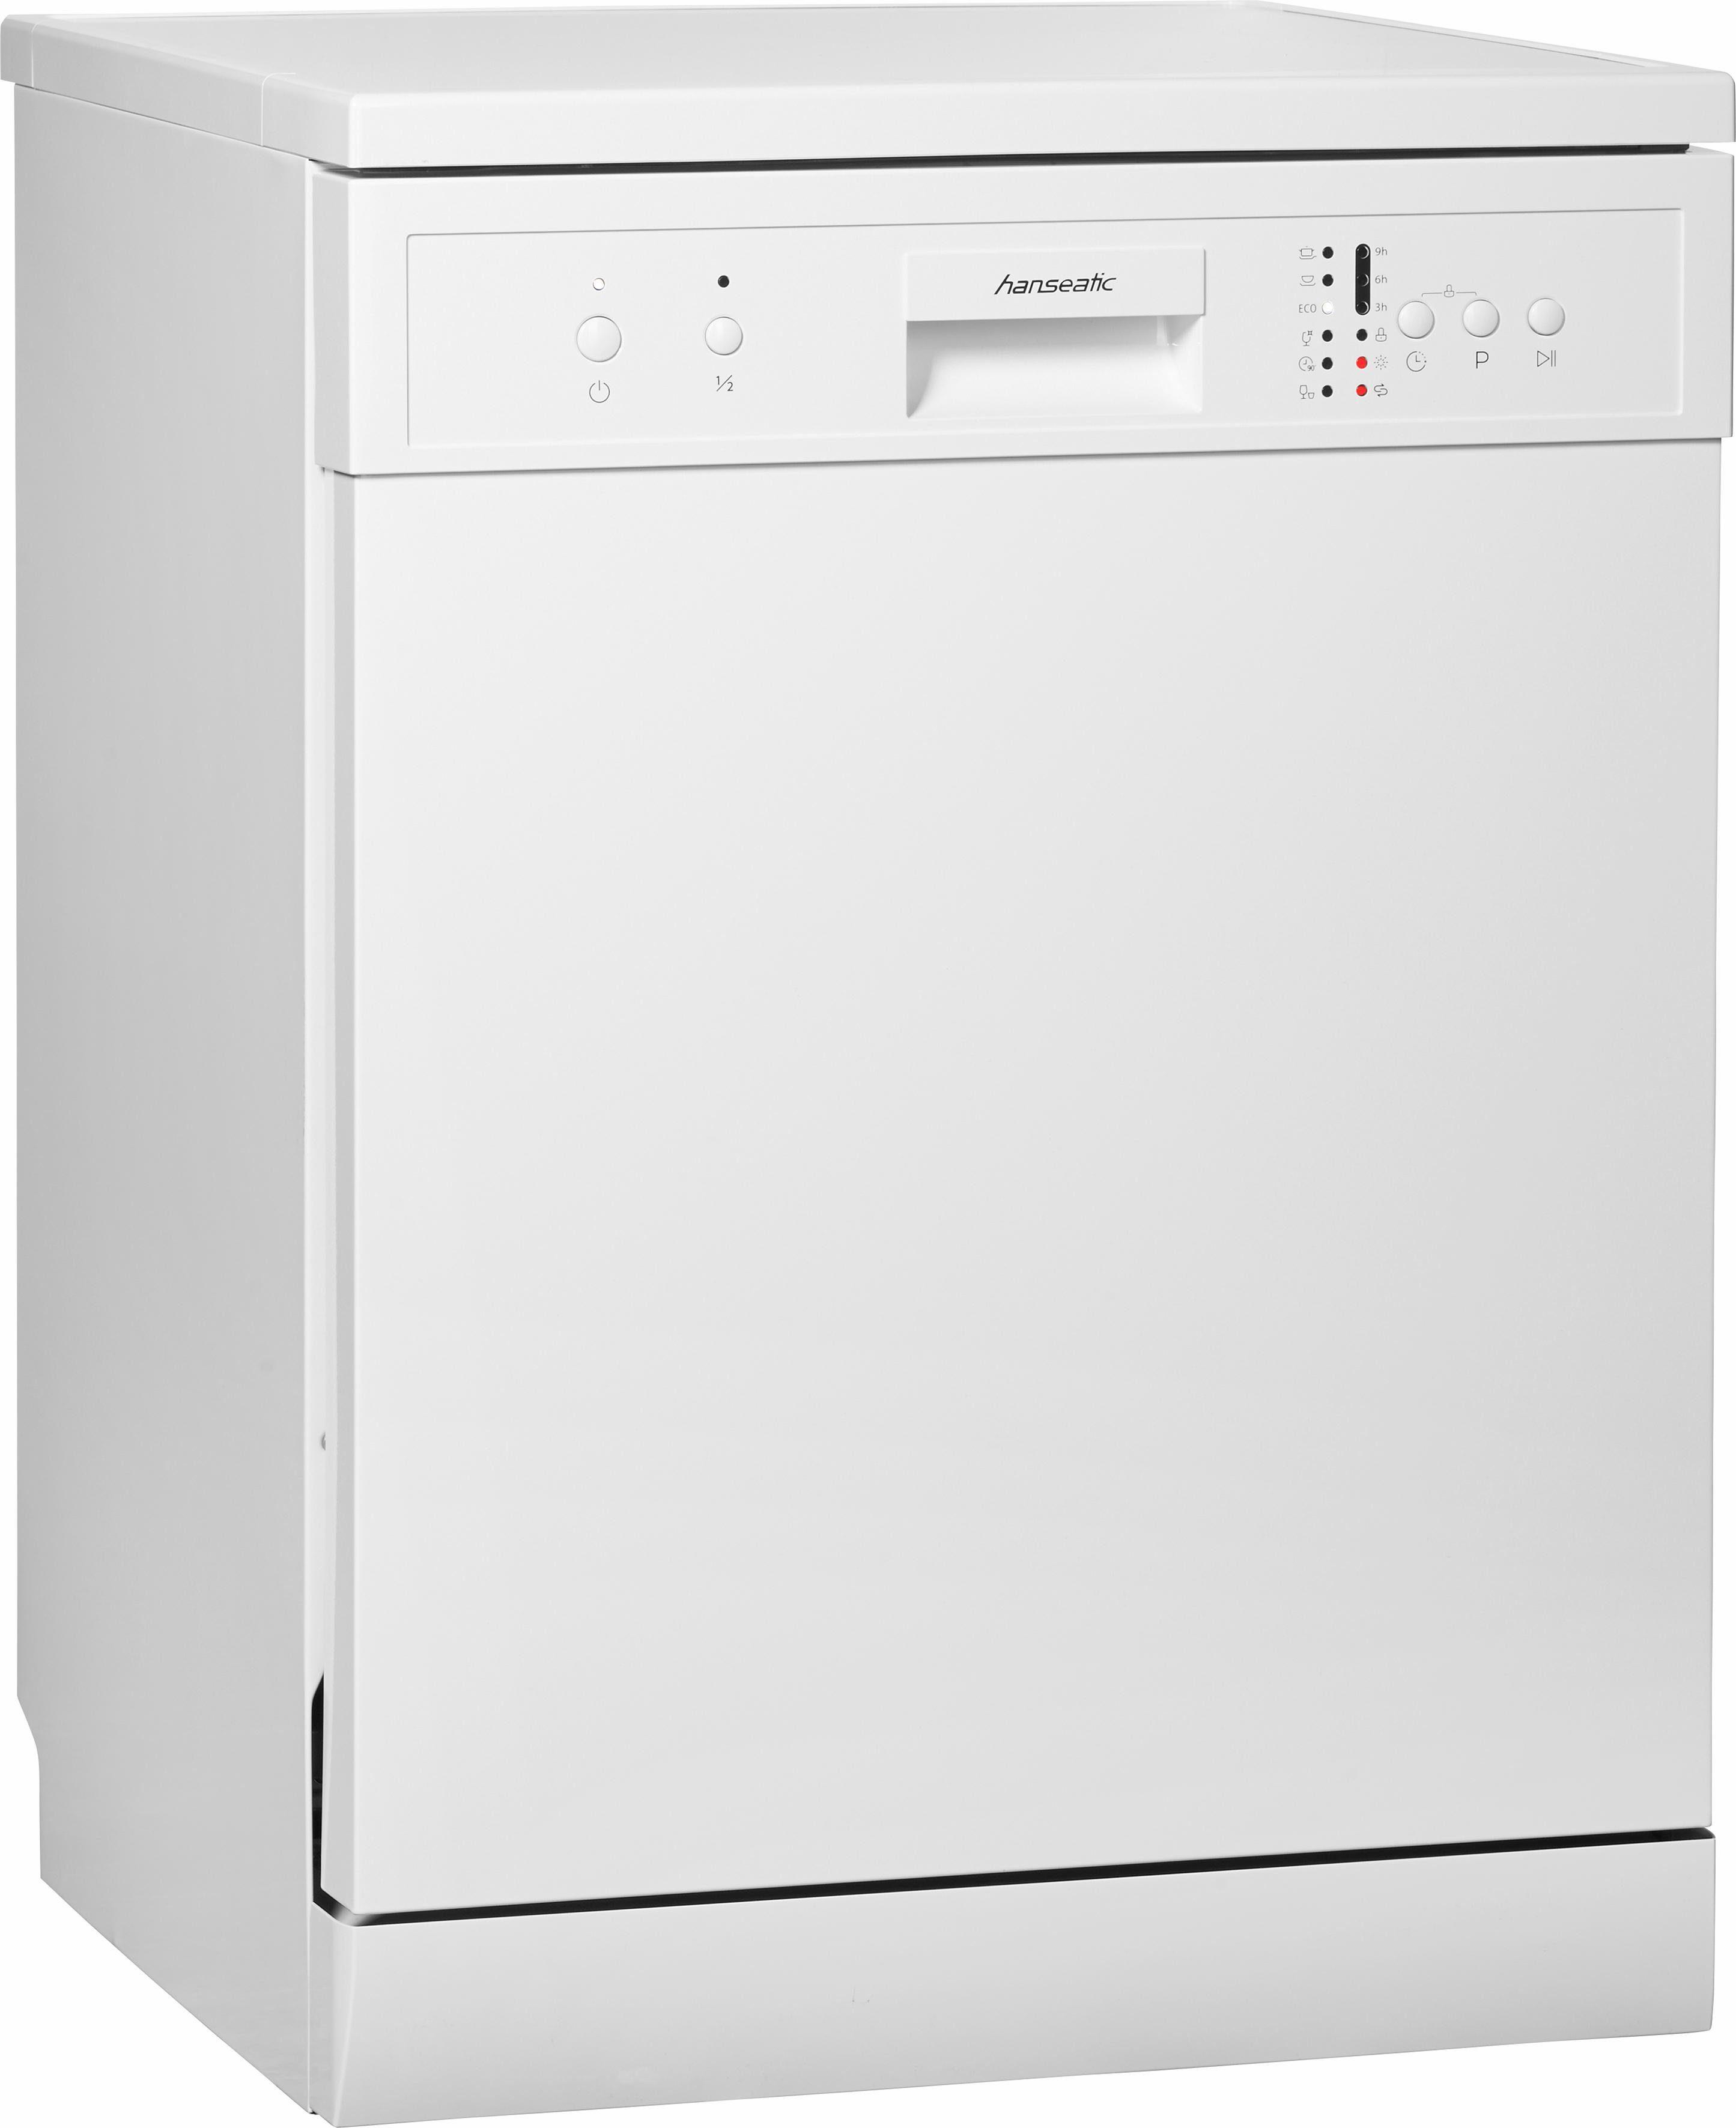 Hanseatic Geschirrspüler WQP12-7635 white A+, A+, 11 Liter, 12 Maßgedecke